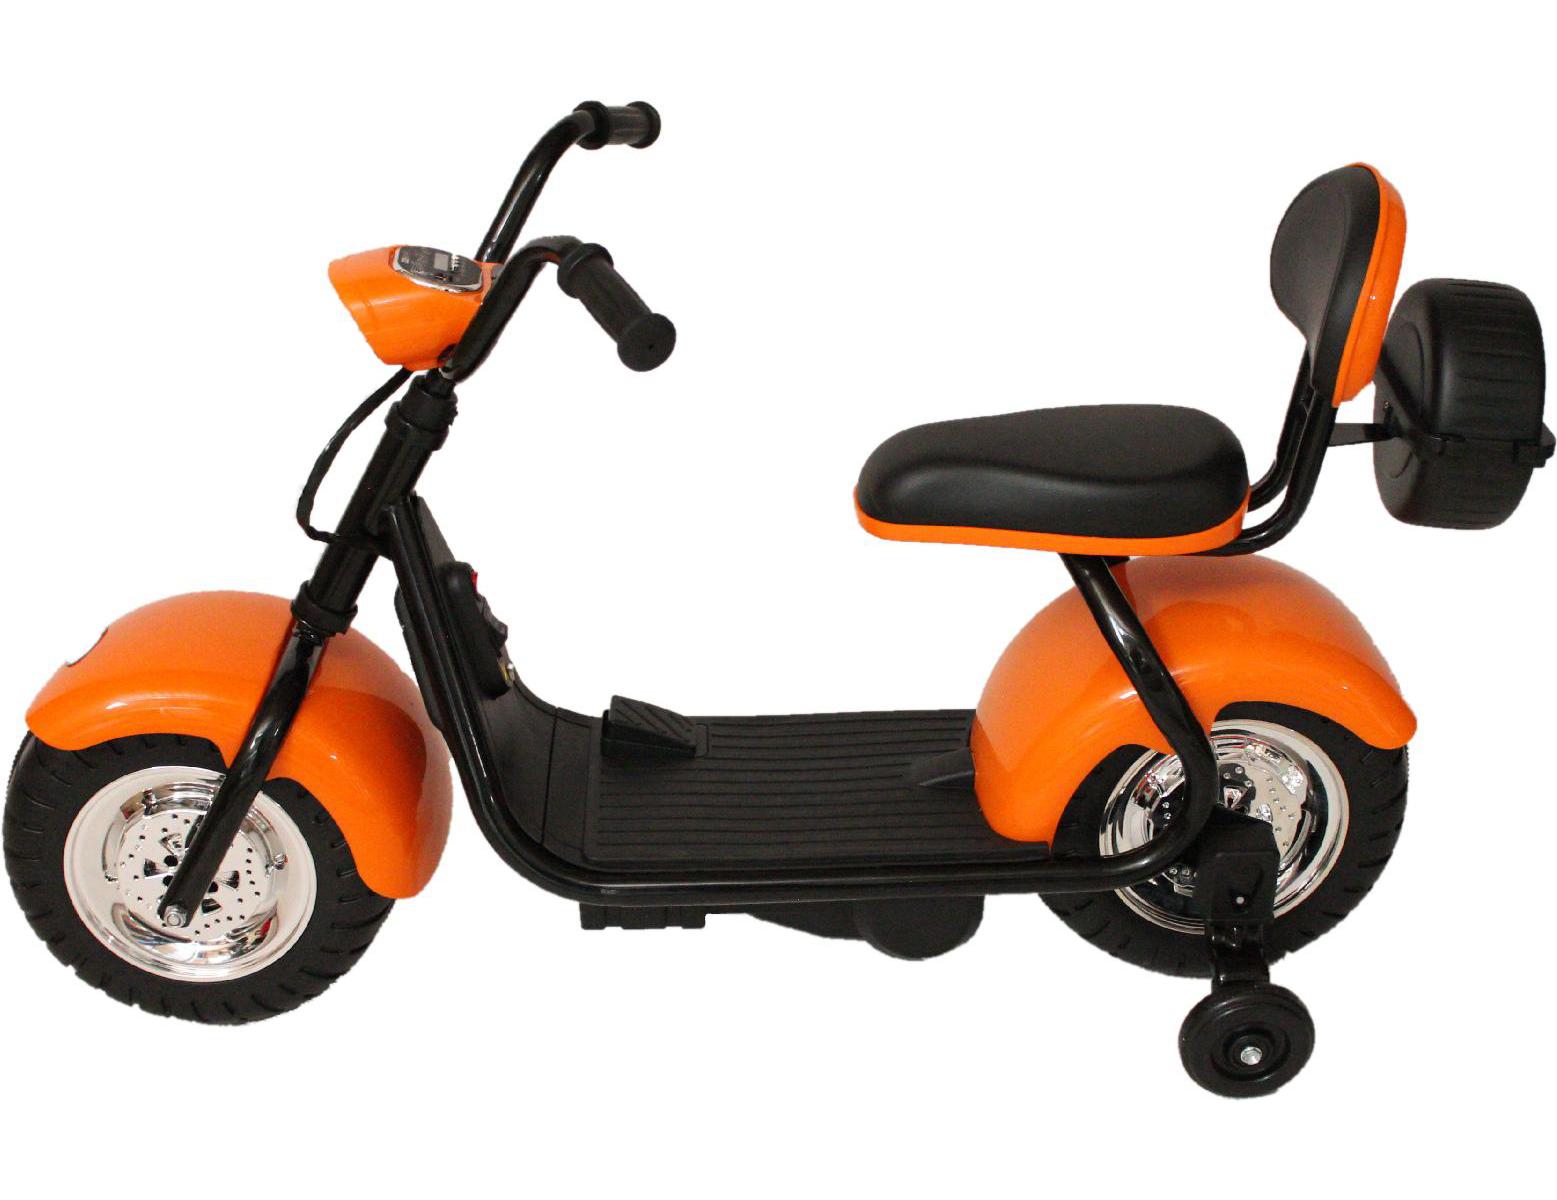 Детский электромотоцикл Barty CityCoco YM708, Оранжевый